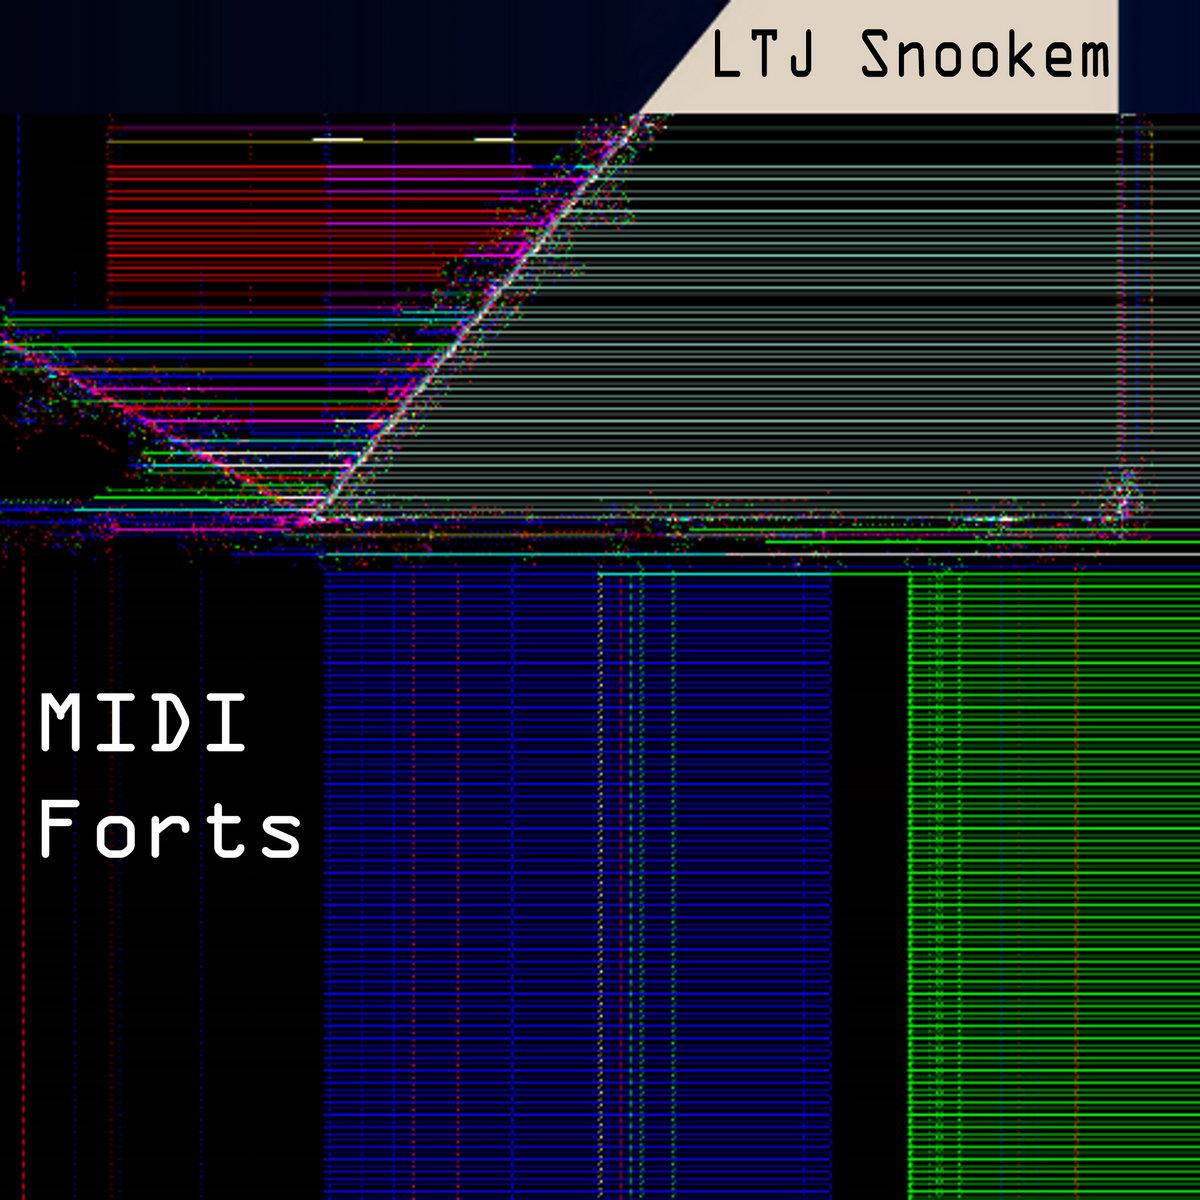 LTJ SNOOKEM by MIDI FORTS